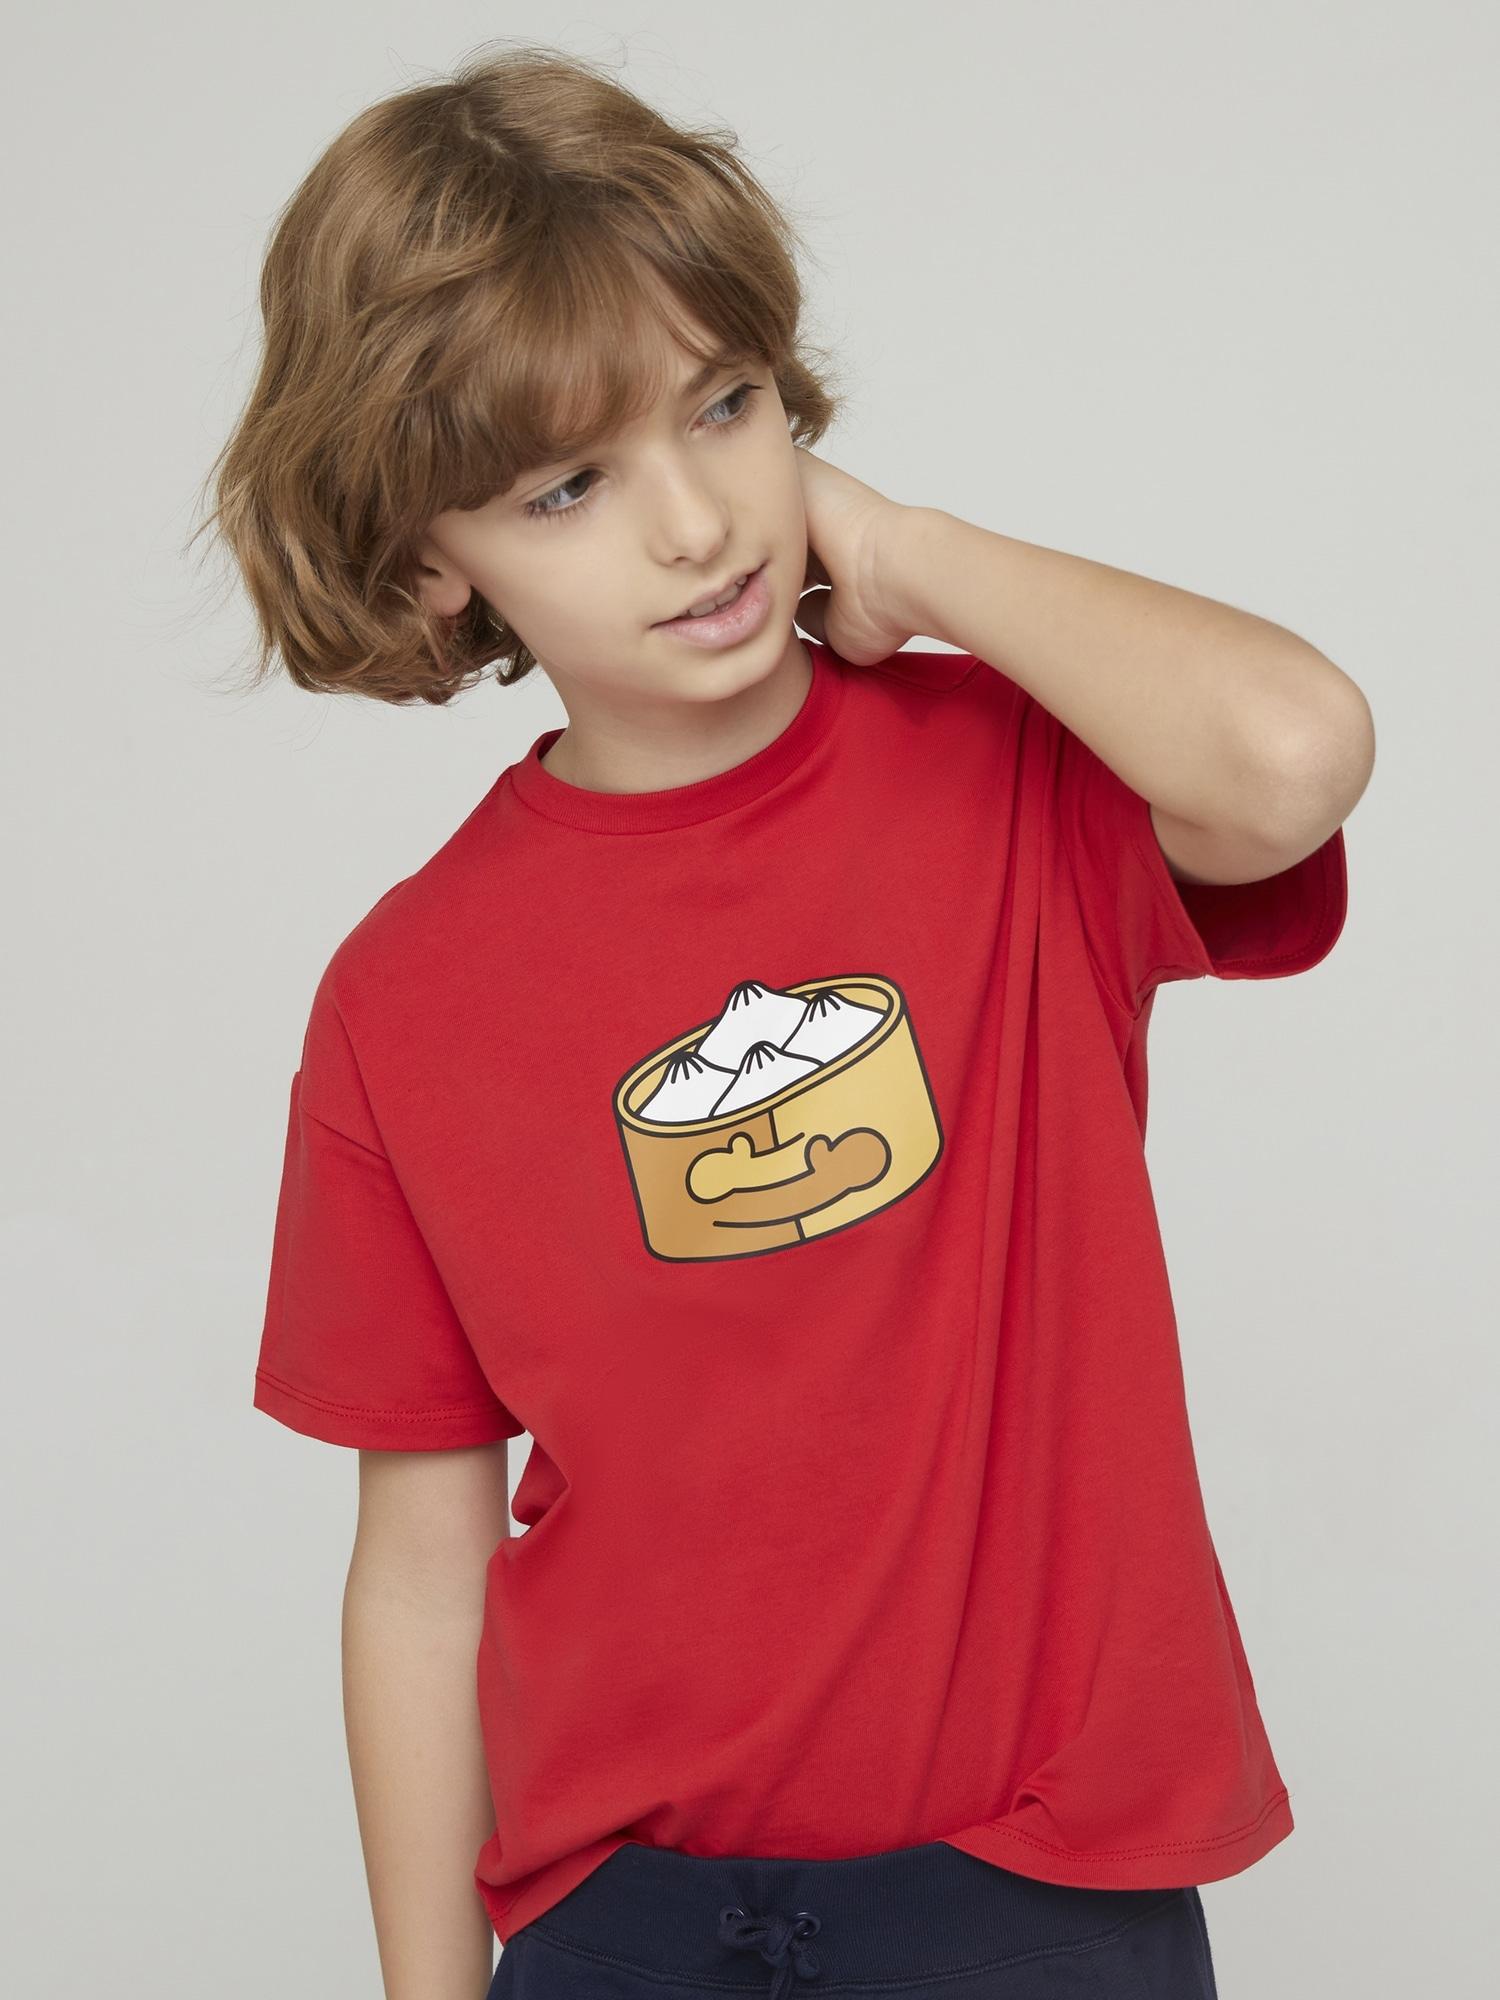 Kenloコレクション クルーネックtシャツ (キッズ・ユニセックス)